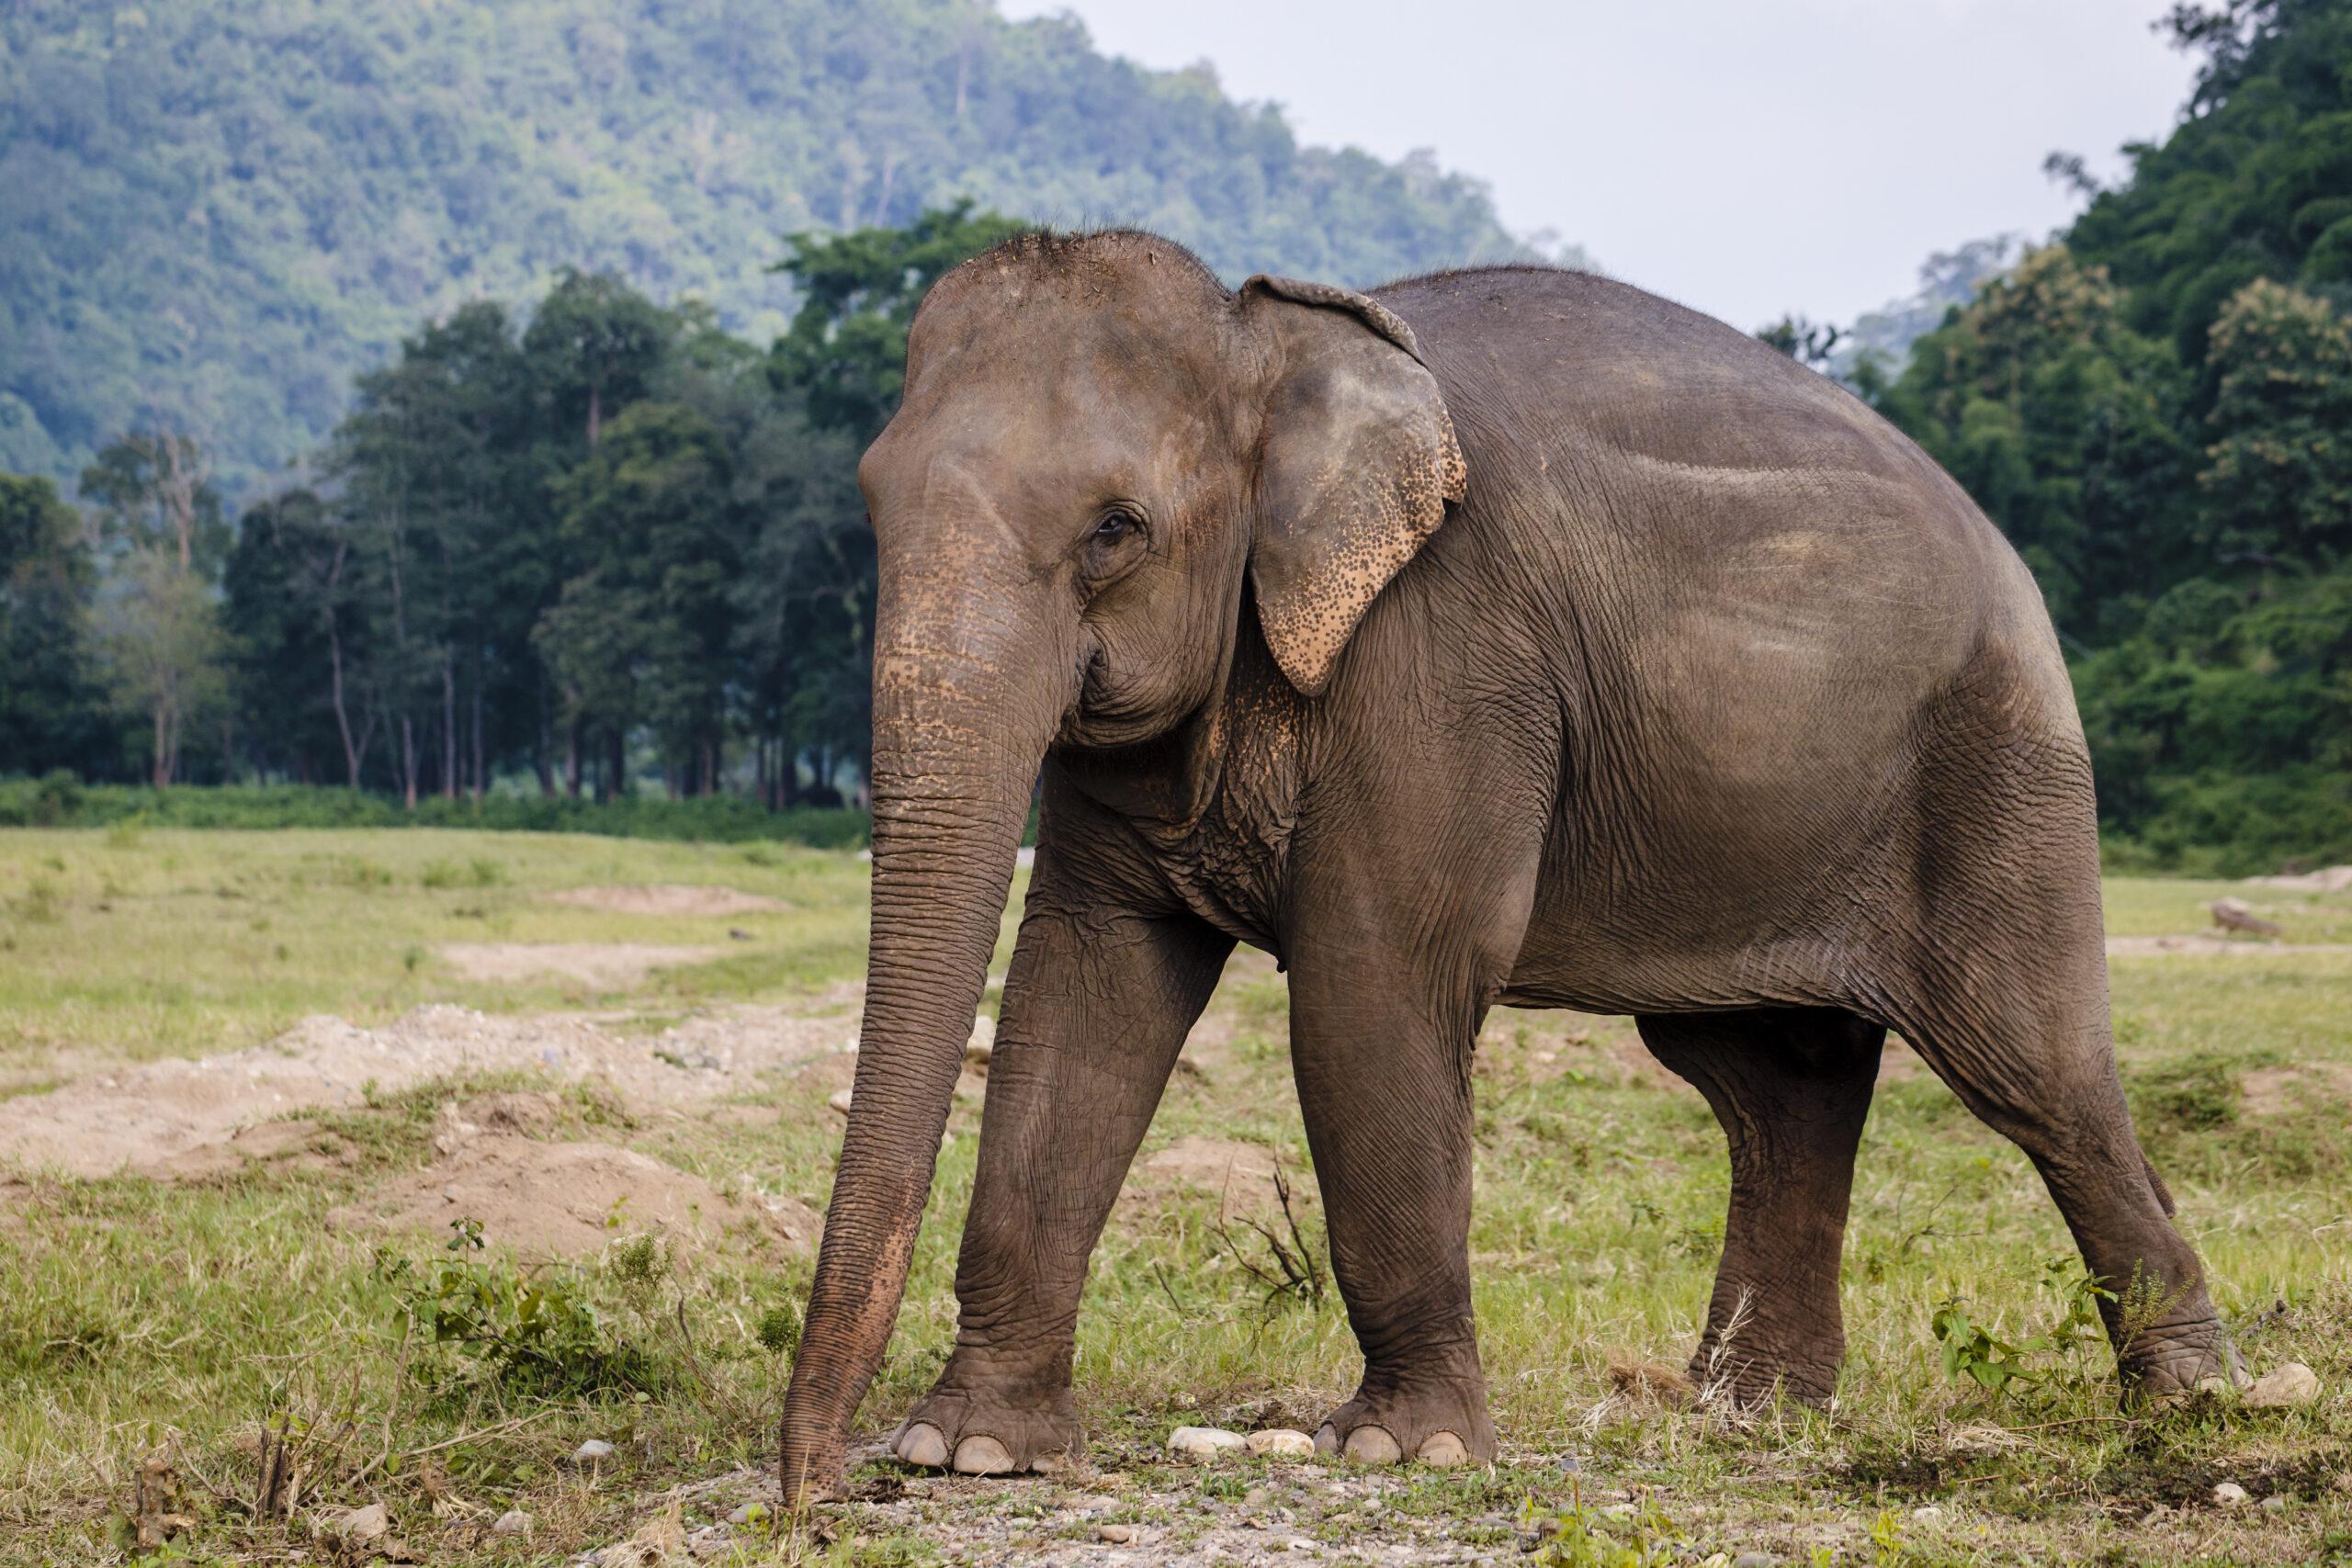 an Asian elephant walking